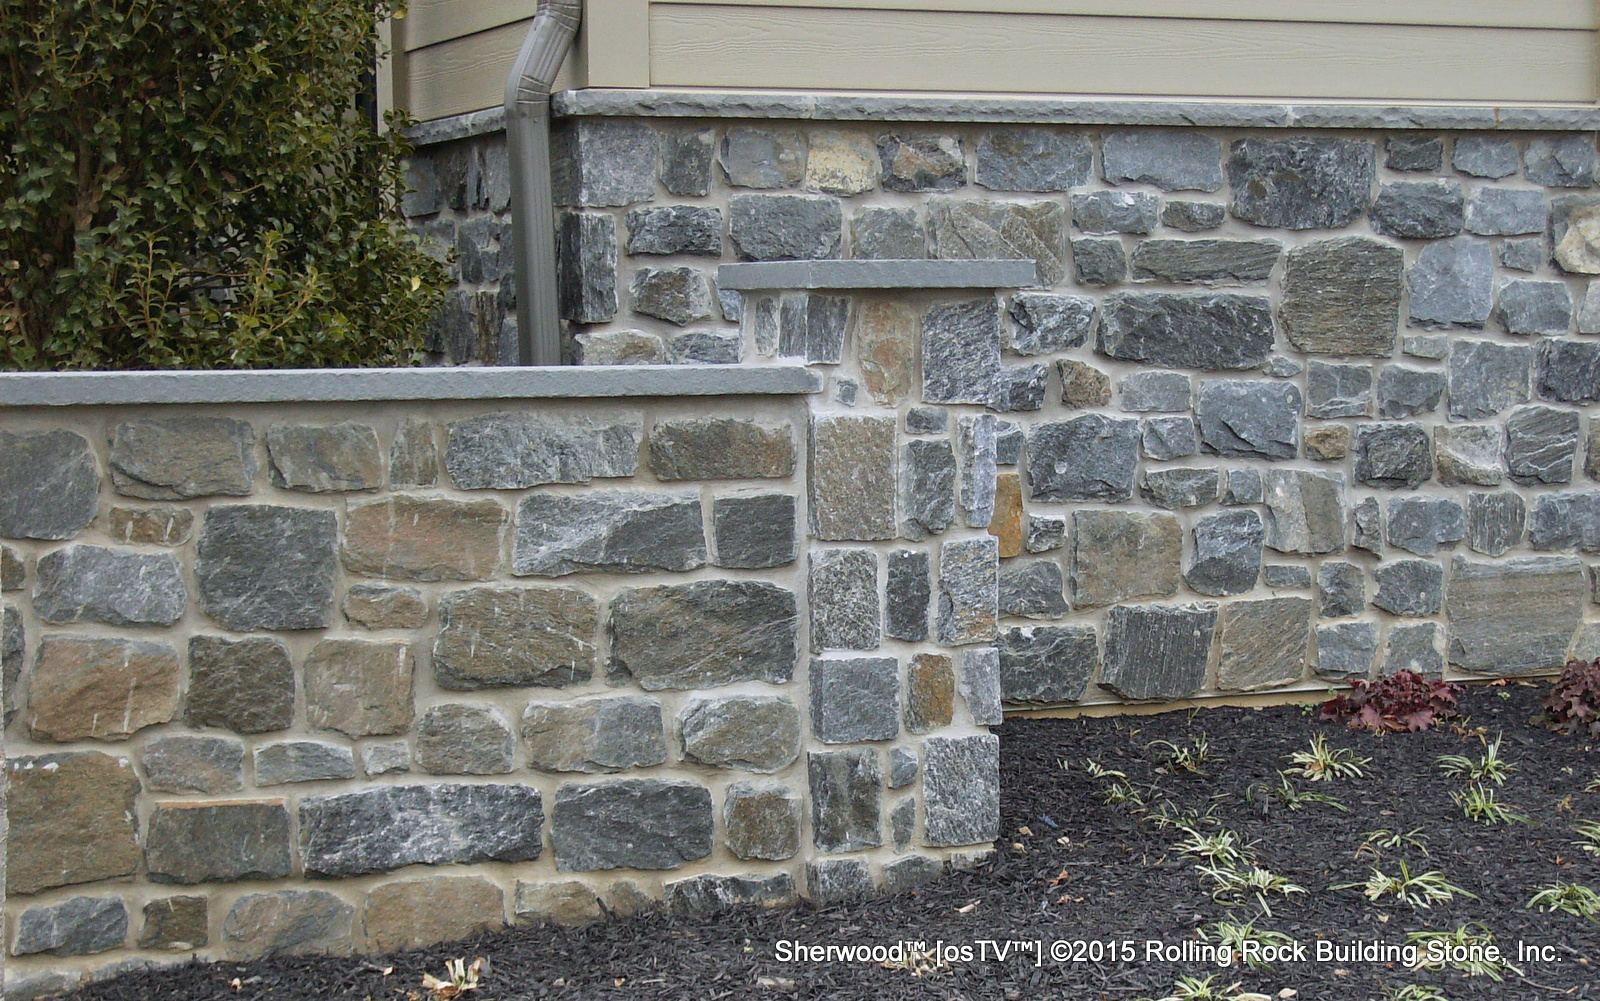 Building Stone Veneer : Sherwood™ rolling rock building stone inc